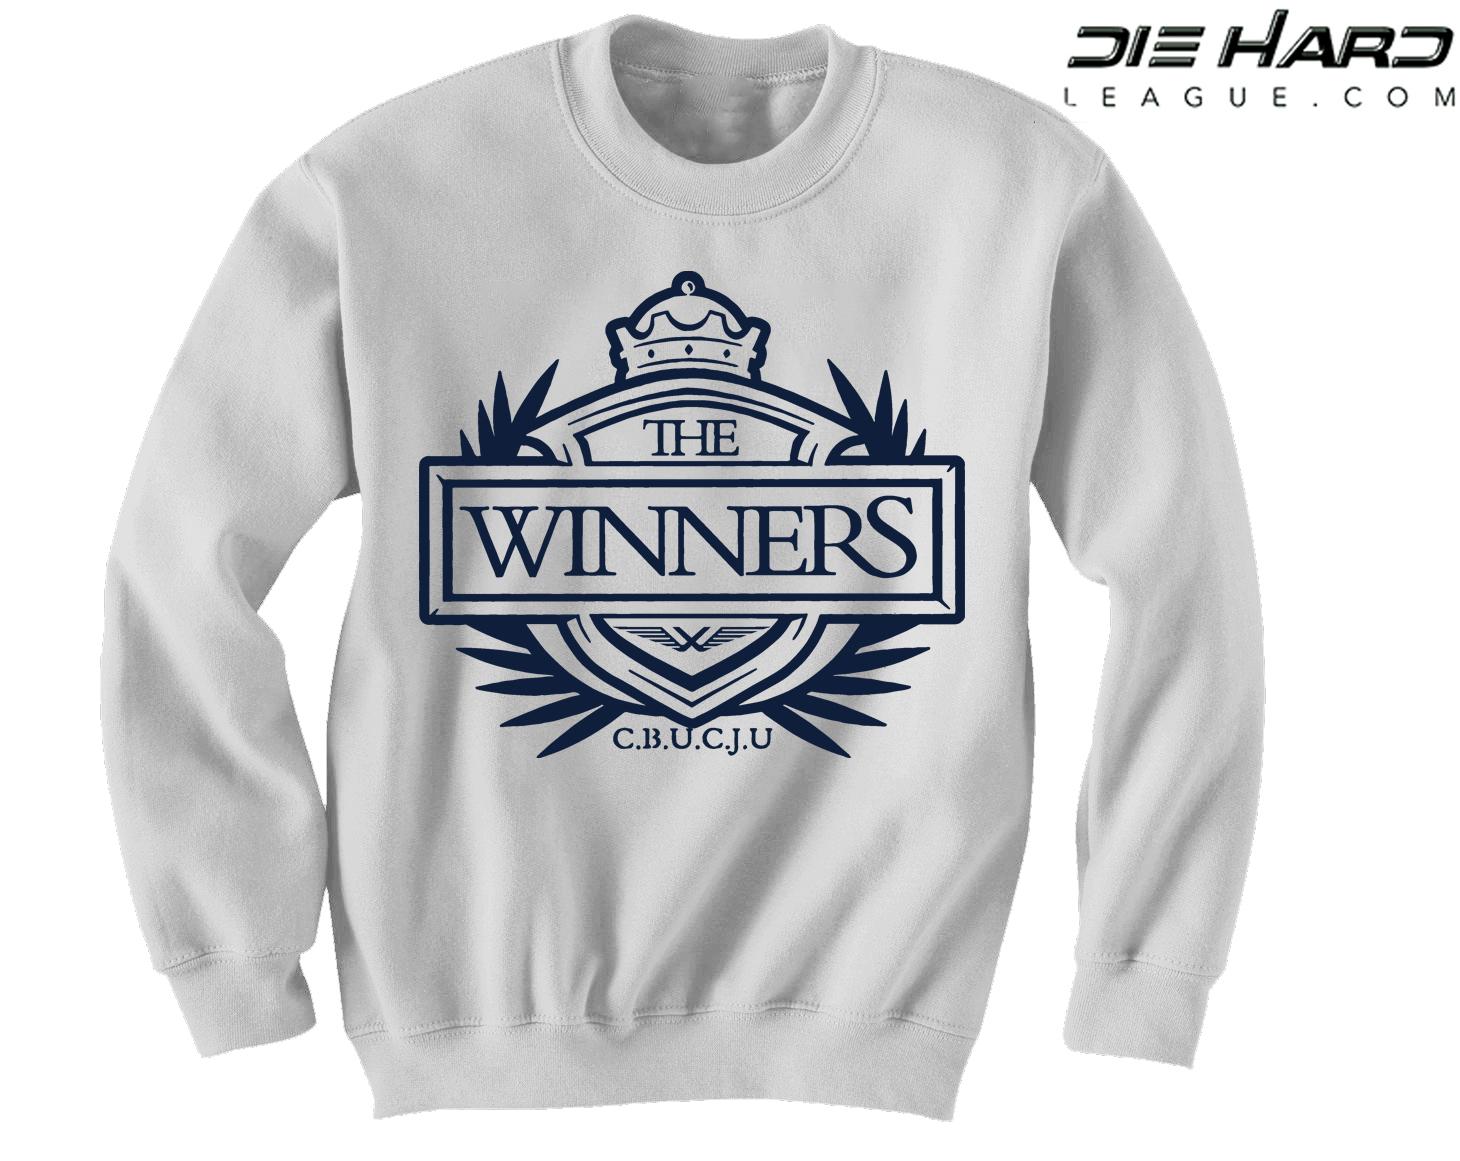 100% authentic 1cd56 ea57f Dallas Cowboys Crewneck Sweatshirt - Winners Crest White Crewneck